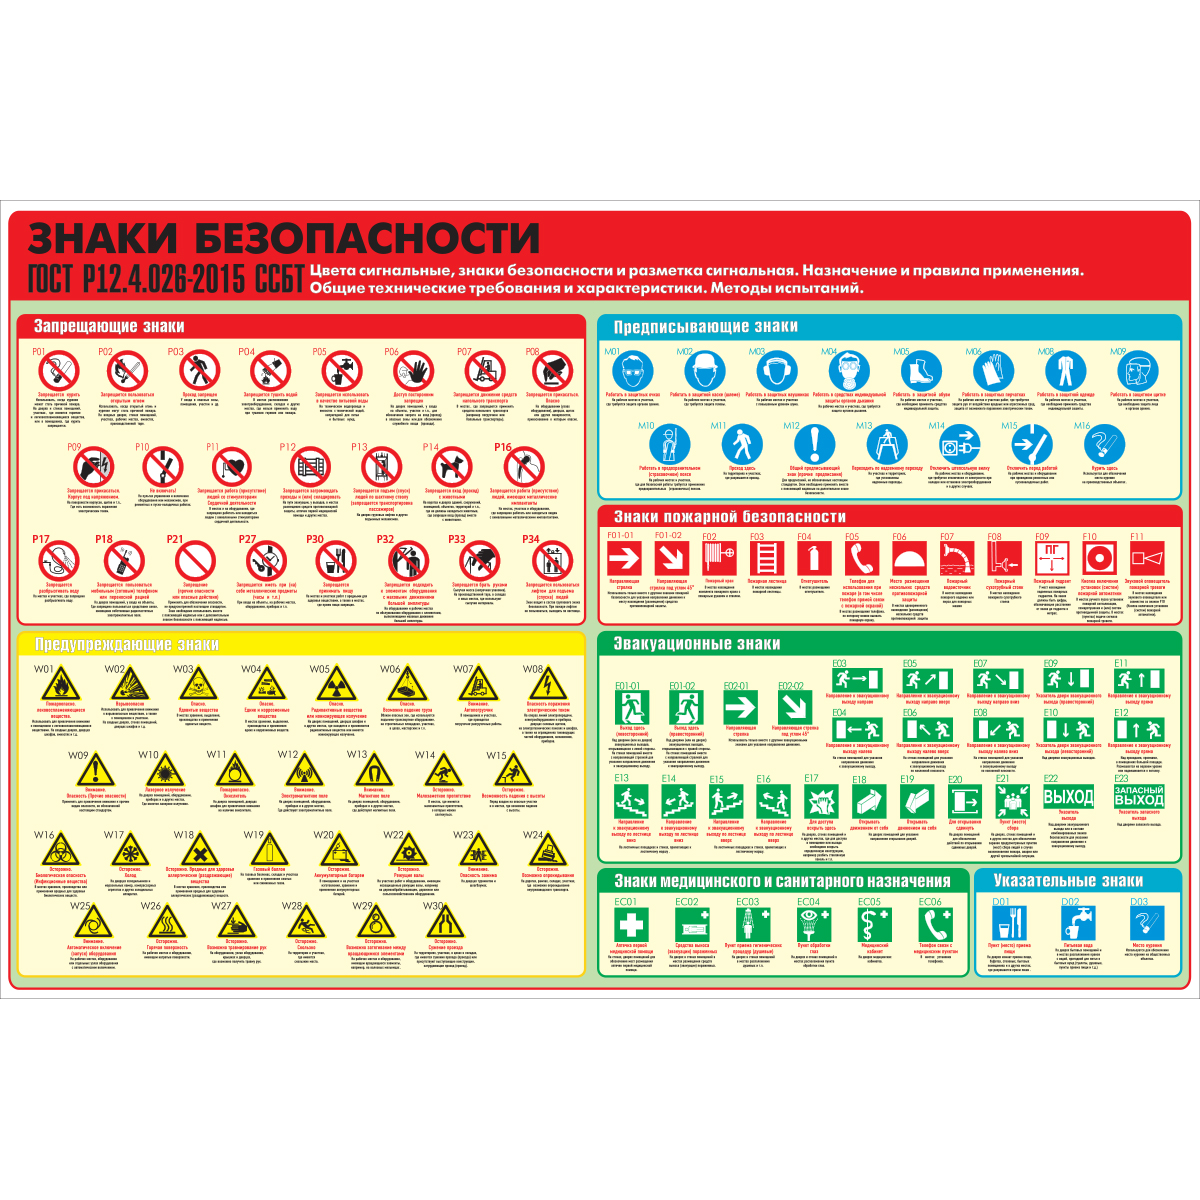 Стенд Знаки безопасности по ГОСТ 12. 4. 026-2015, 1000х1500 мм